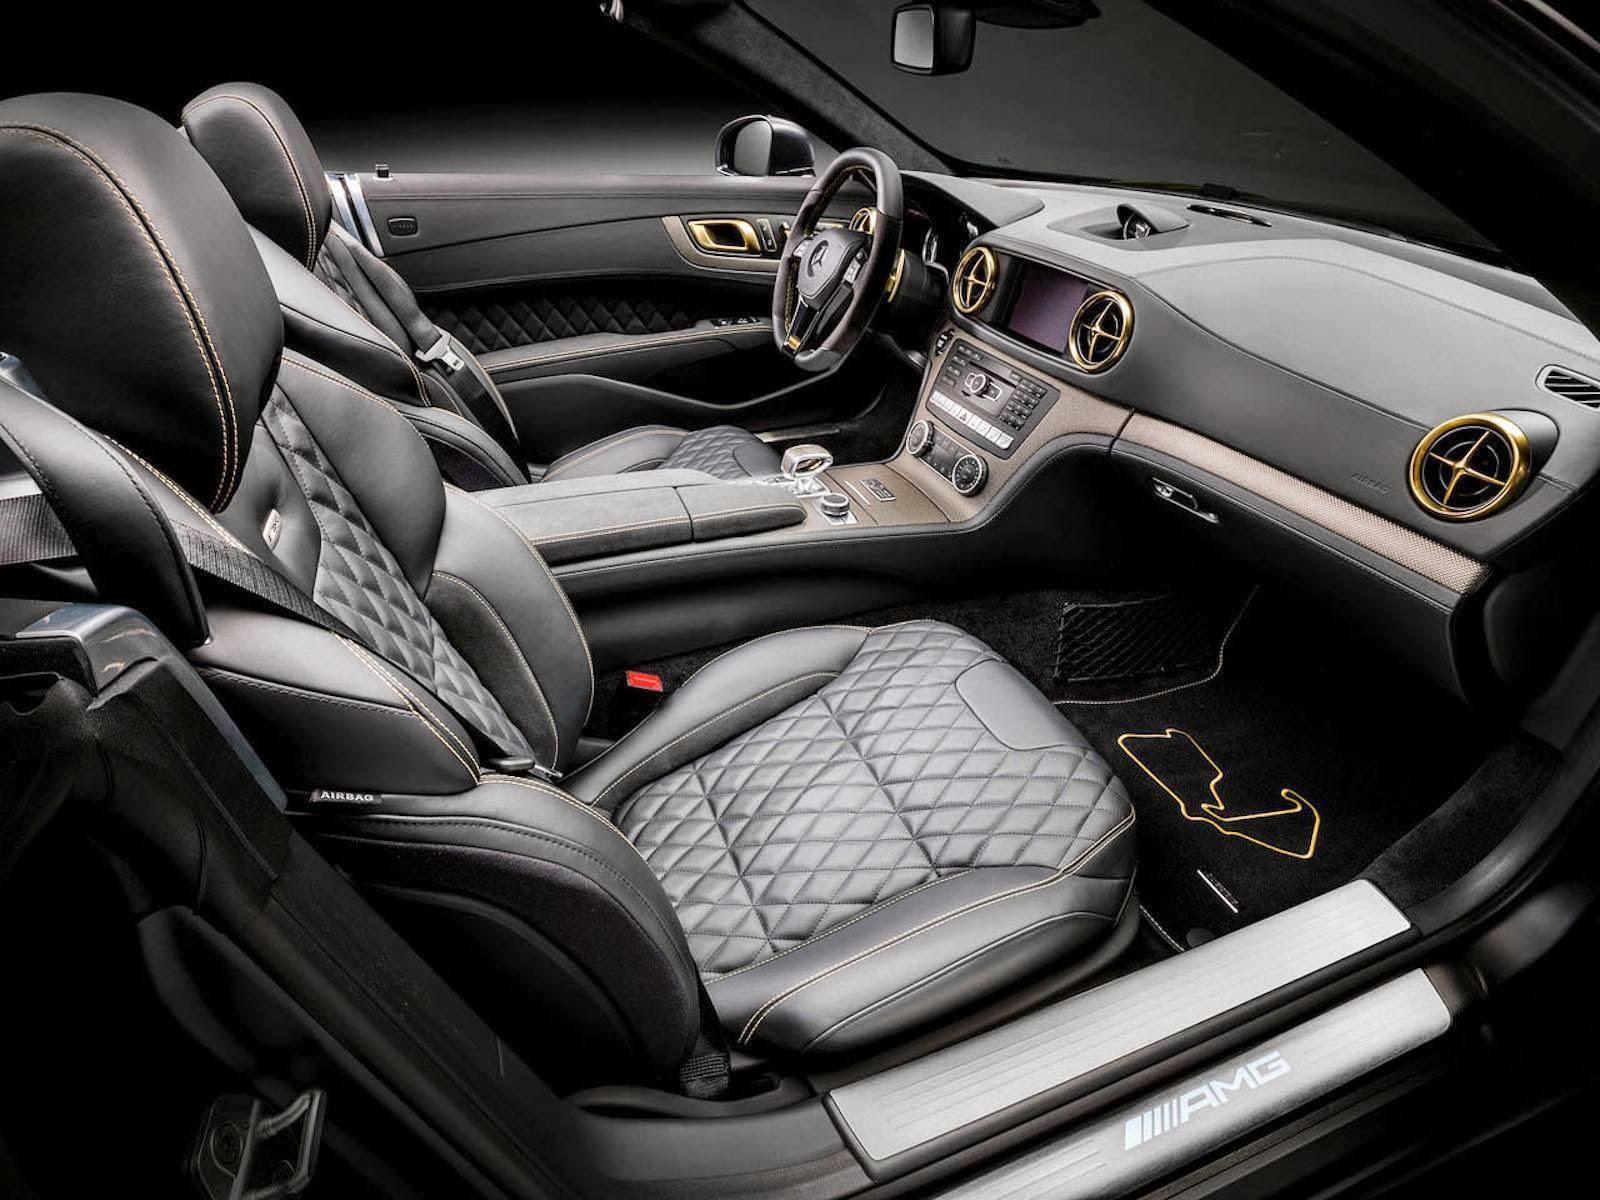 Nuevo Mercedes SL63 AMG Championship 2014 Collector's Edition